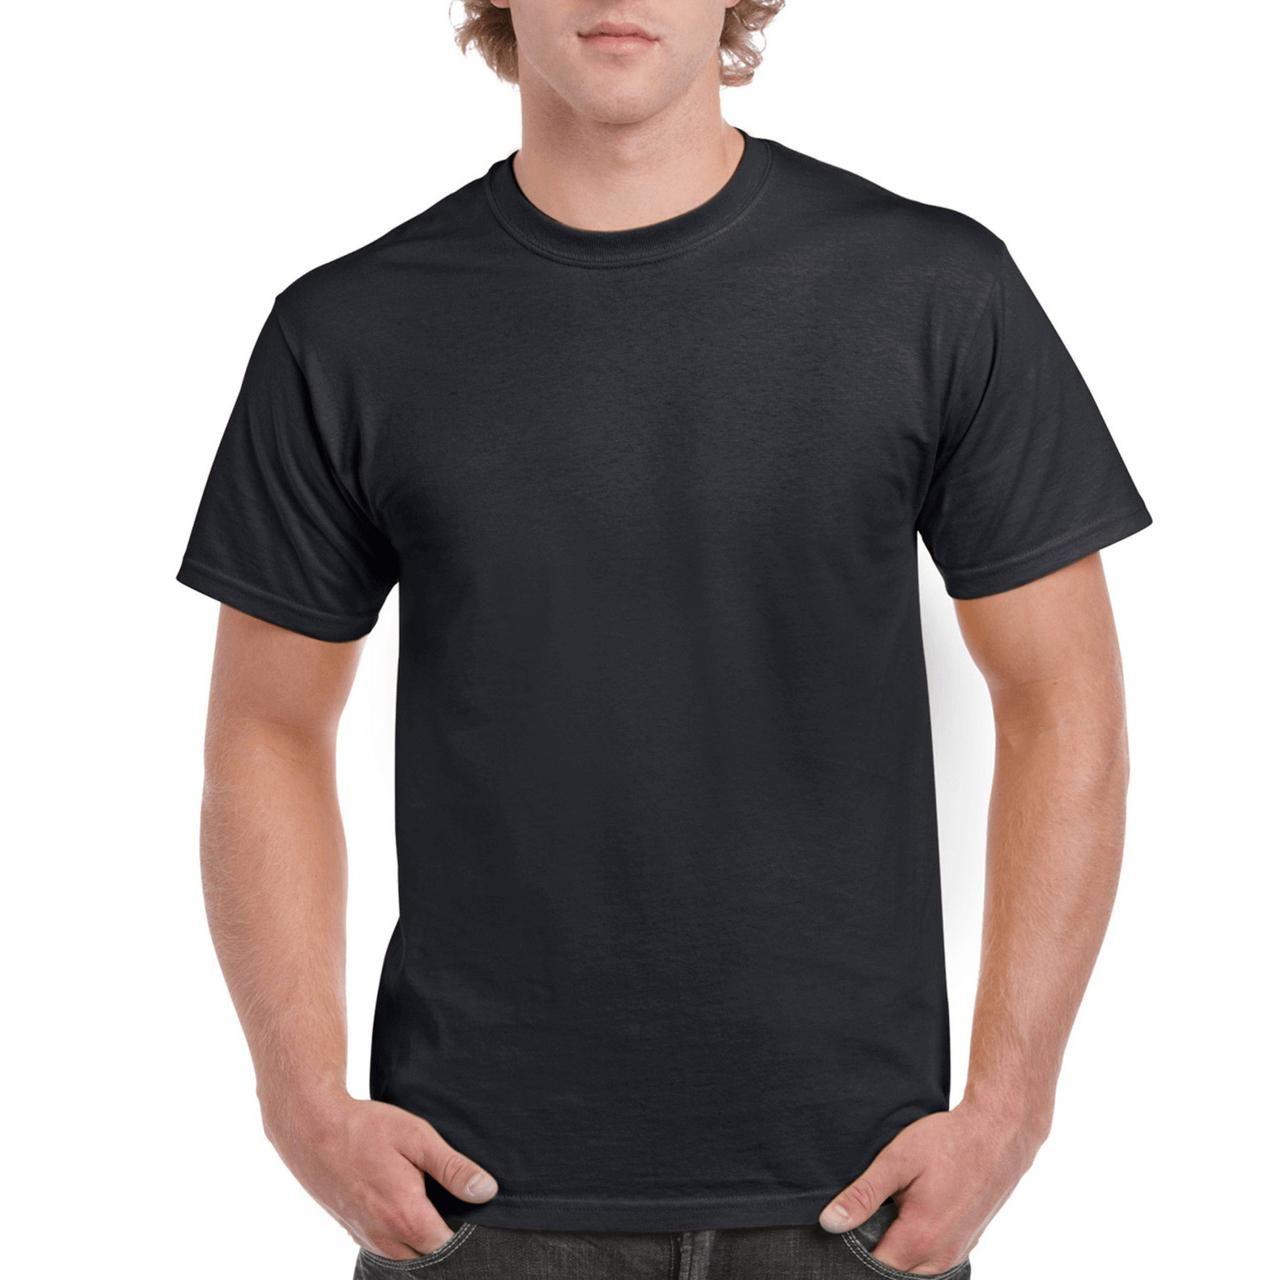 Hombre clásico básico sólido ultra suave algodón camiseta nuevo estilo para hombre manga corta verano camiseta algodón o collar t shirts